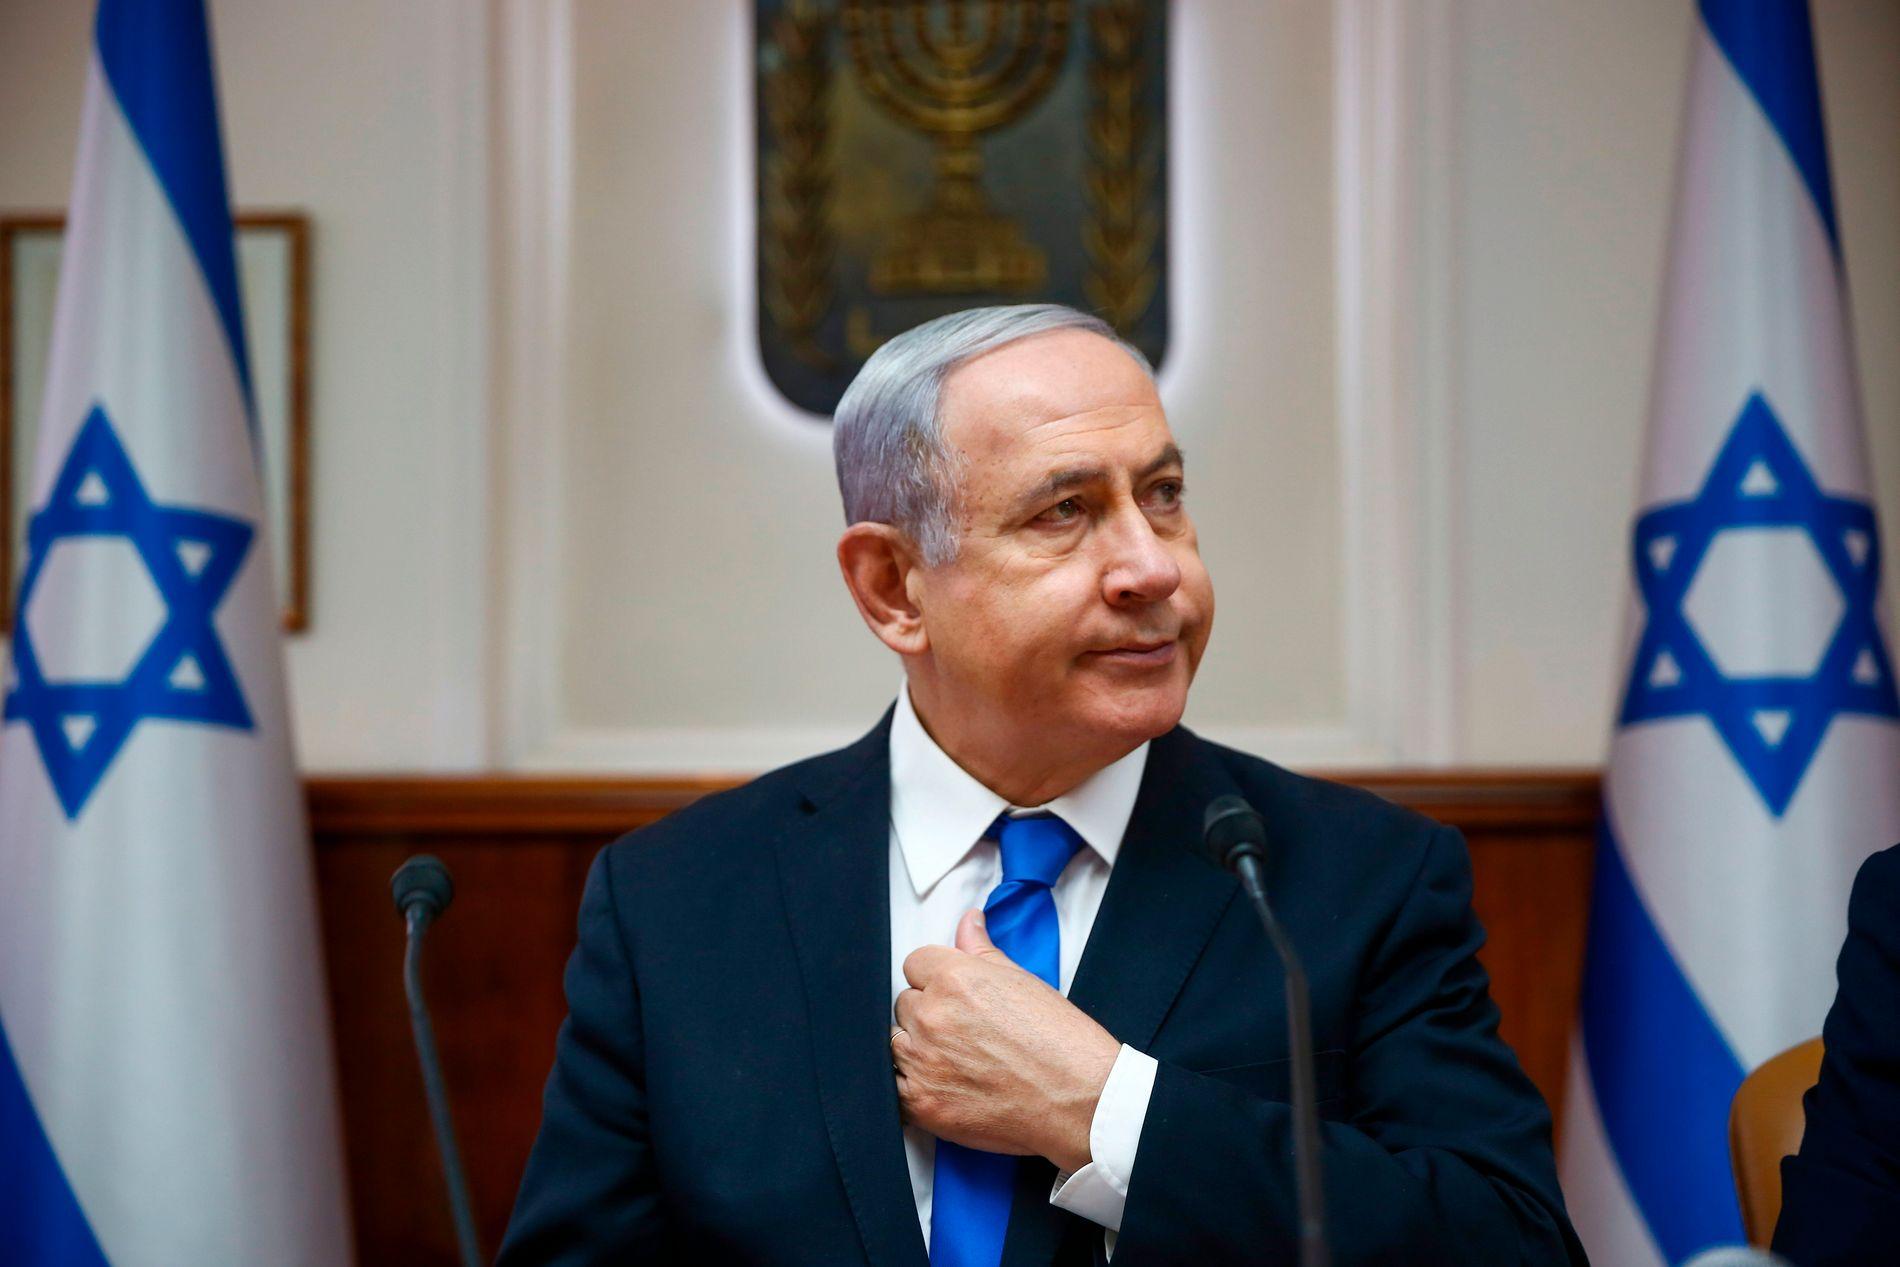 STATSMINISTER: Benjamin Netanyahu leder Israel.